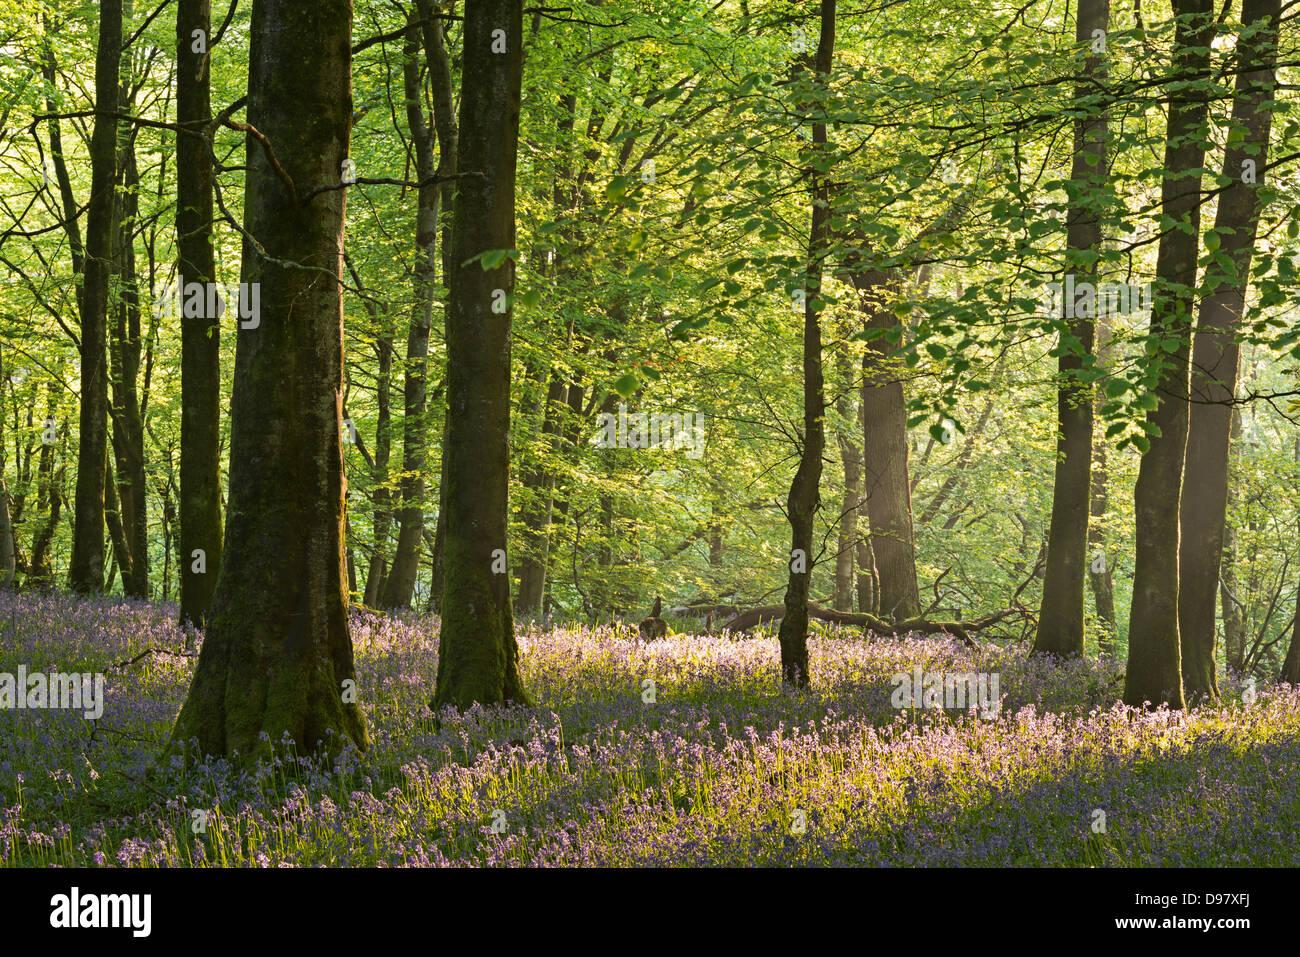 Bluebells flowering in a woodland, Exmoor National Park, Devon, England. - Stock Image